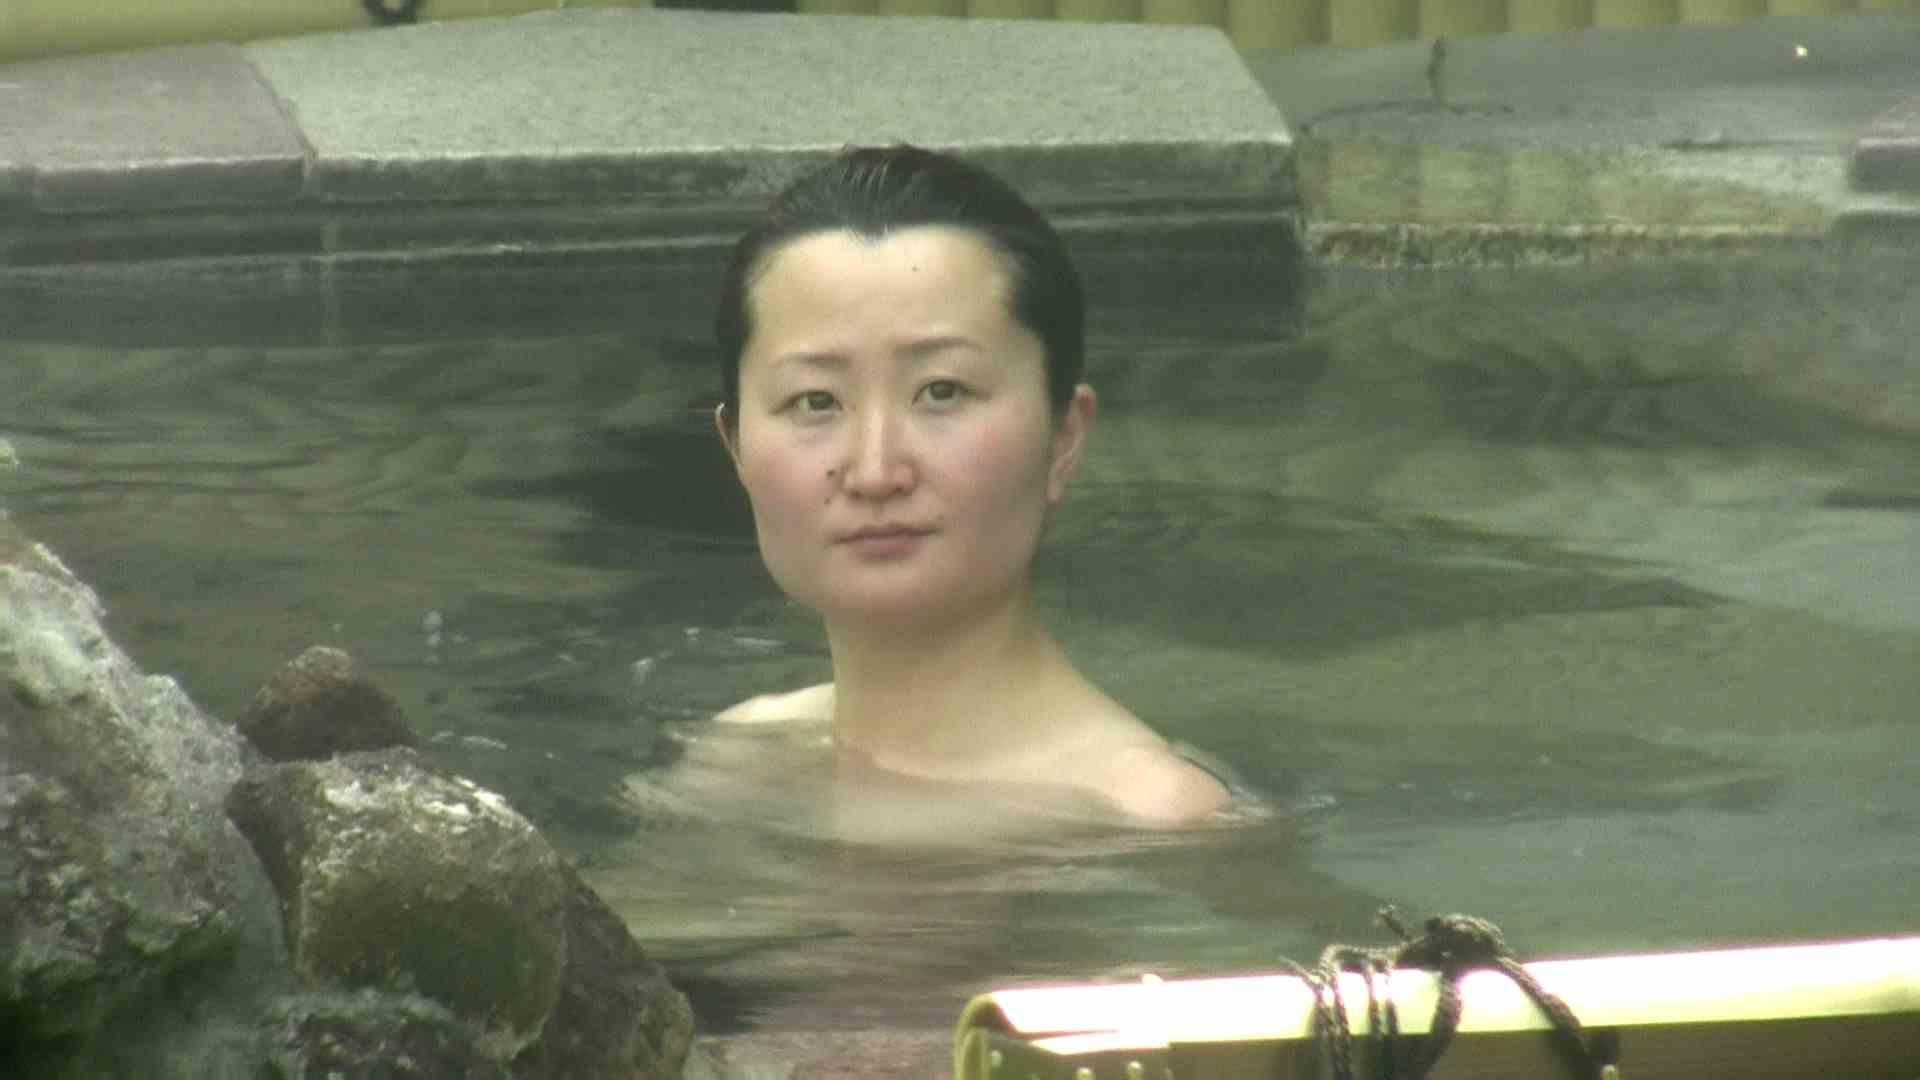 Aquaな露天風呂Vol.632 盗撮 | OLセックス  70画像 22